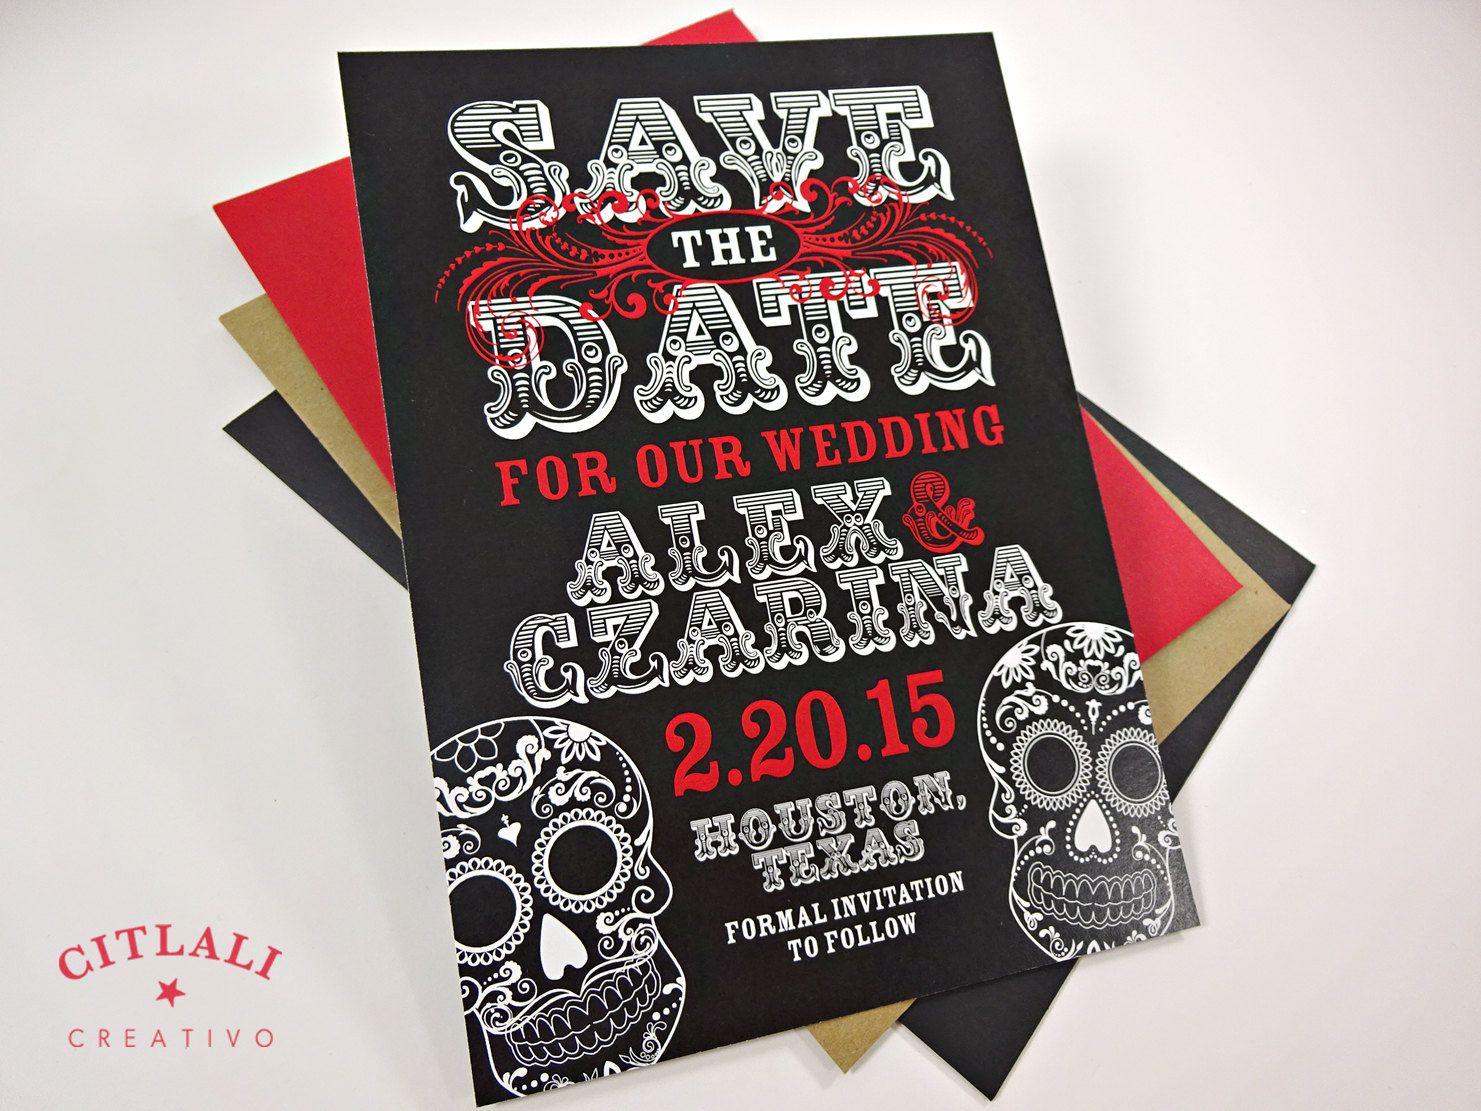 skull wedding invitations Day of the dead Wedding Save the Date Dia de los Muertos Skull Announcement Invitation